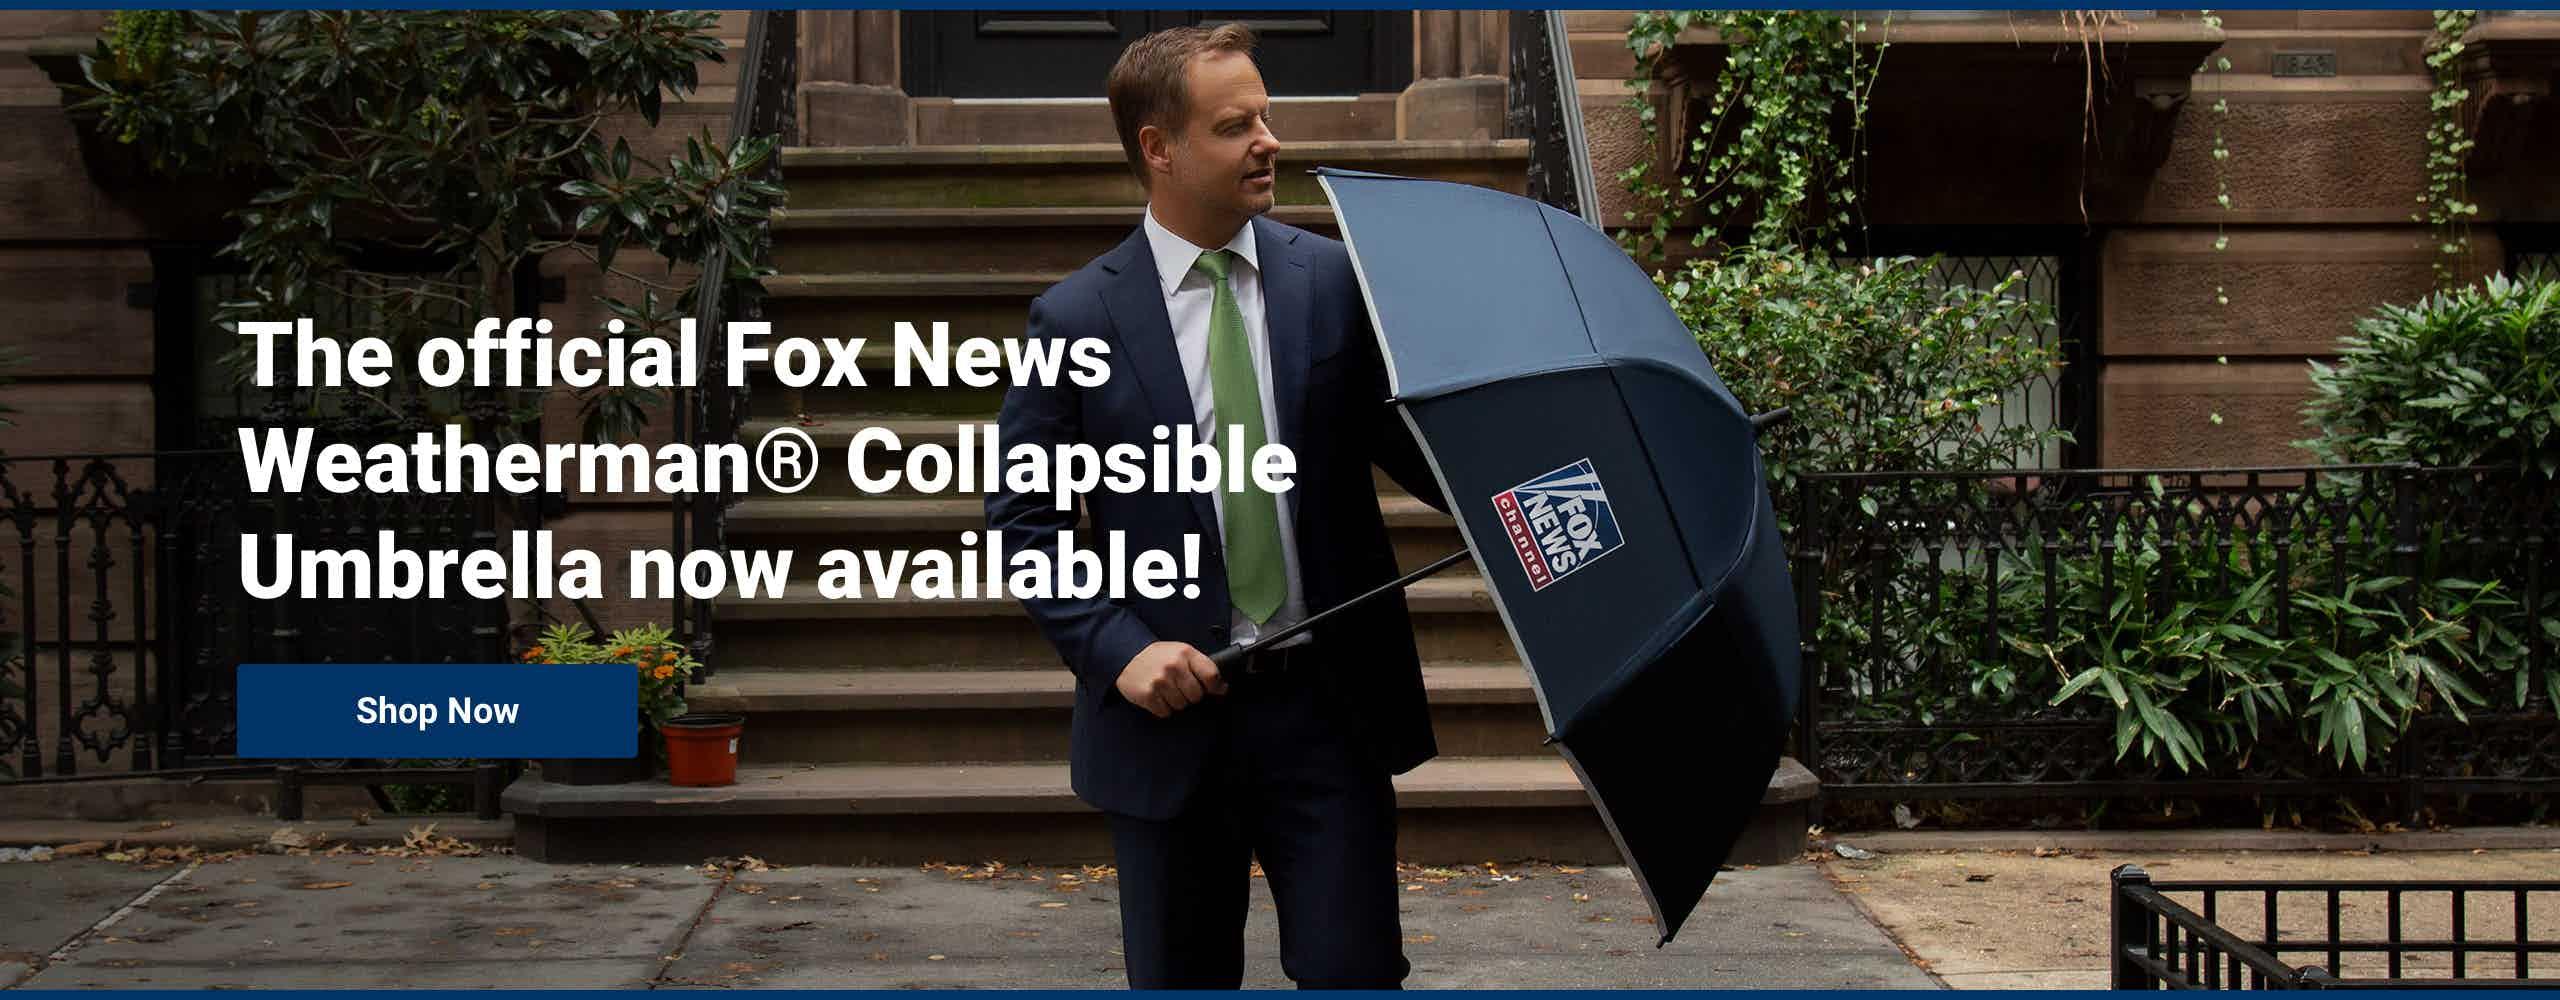 Fox News Collapsible Umbrella